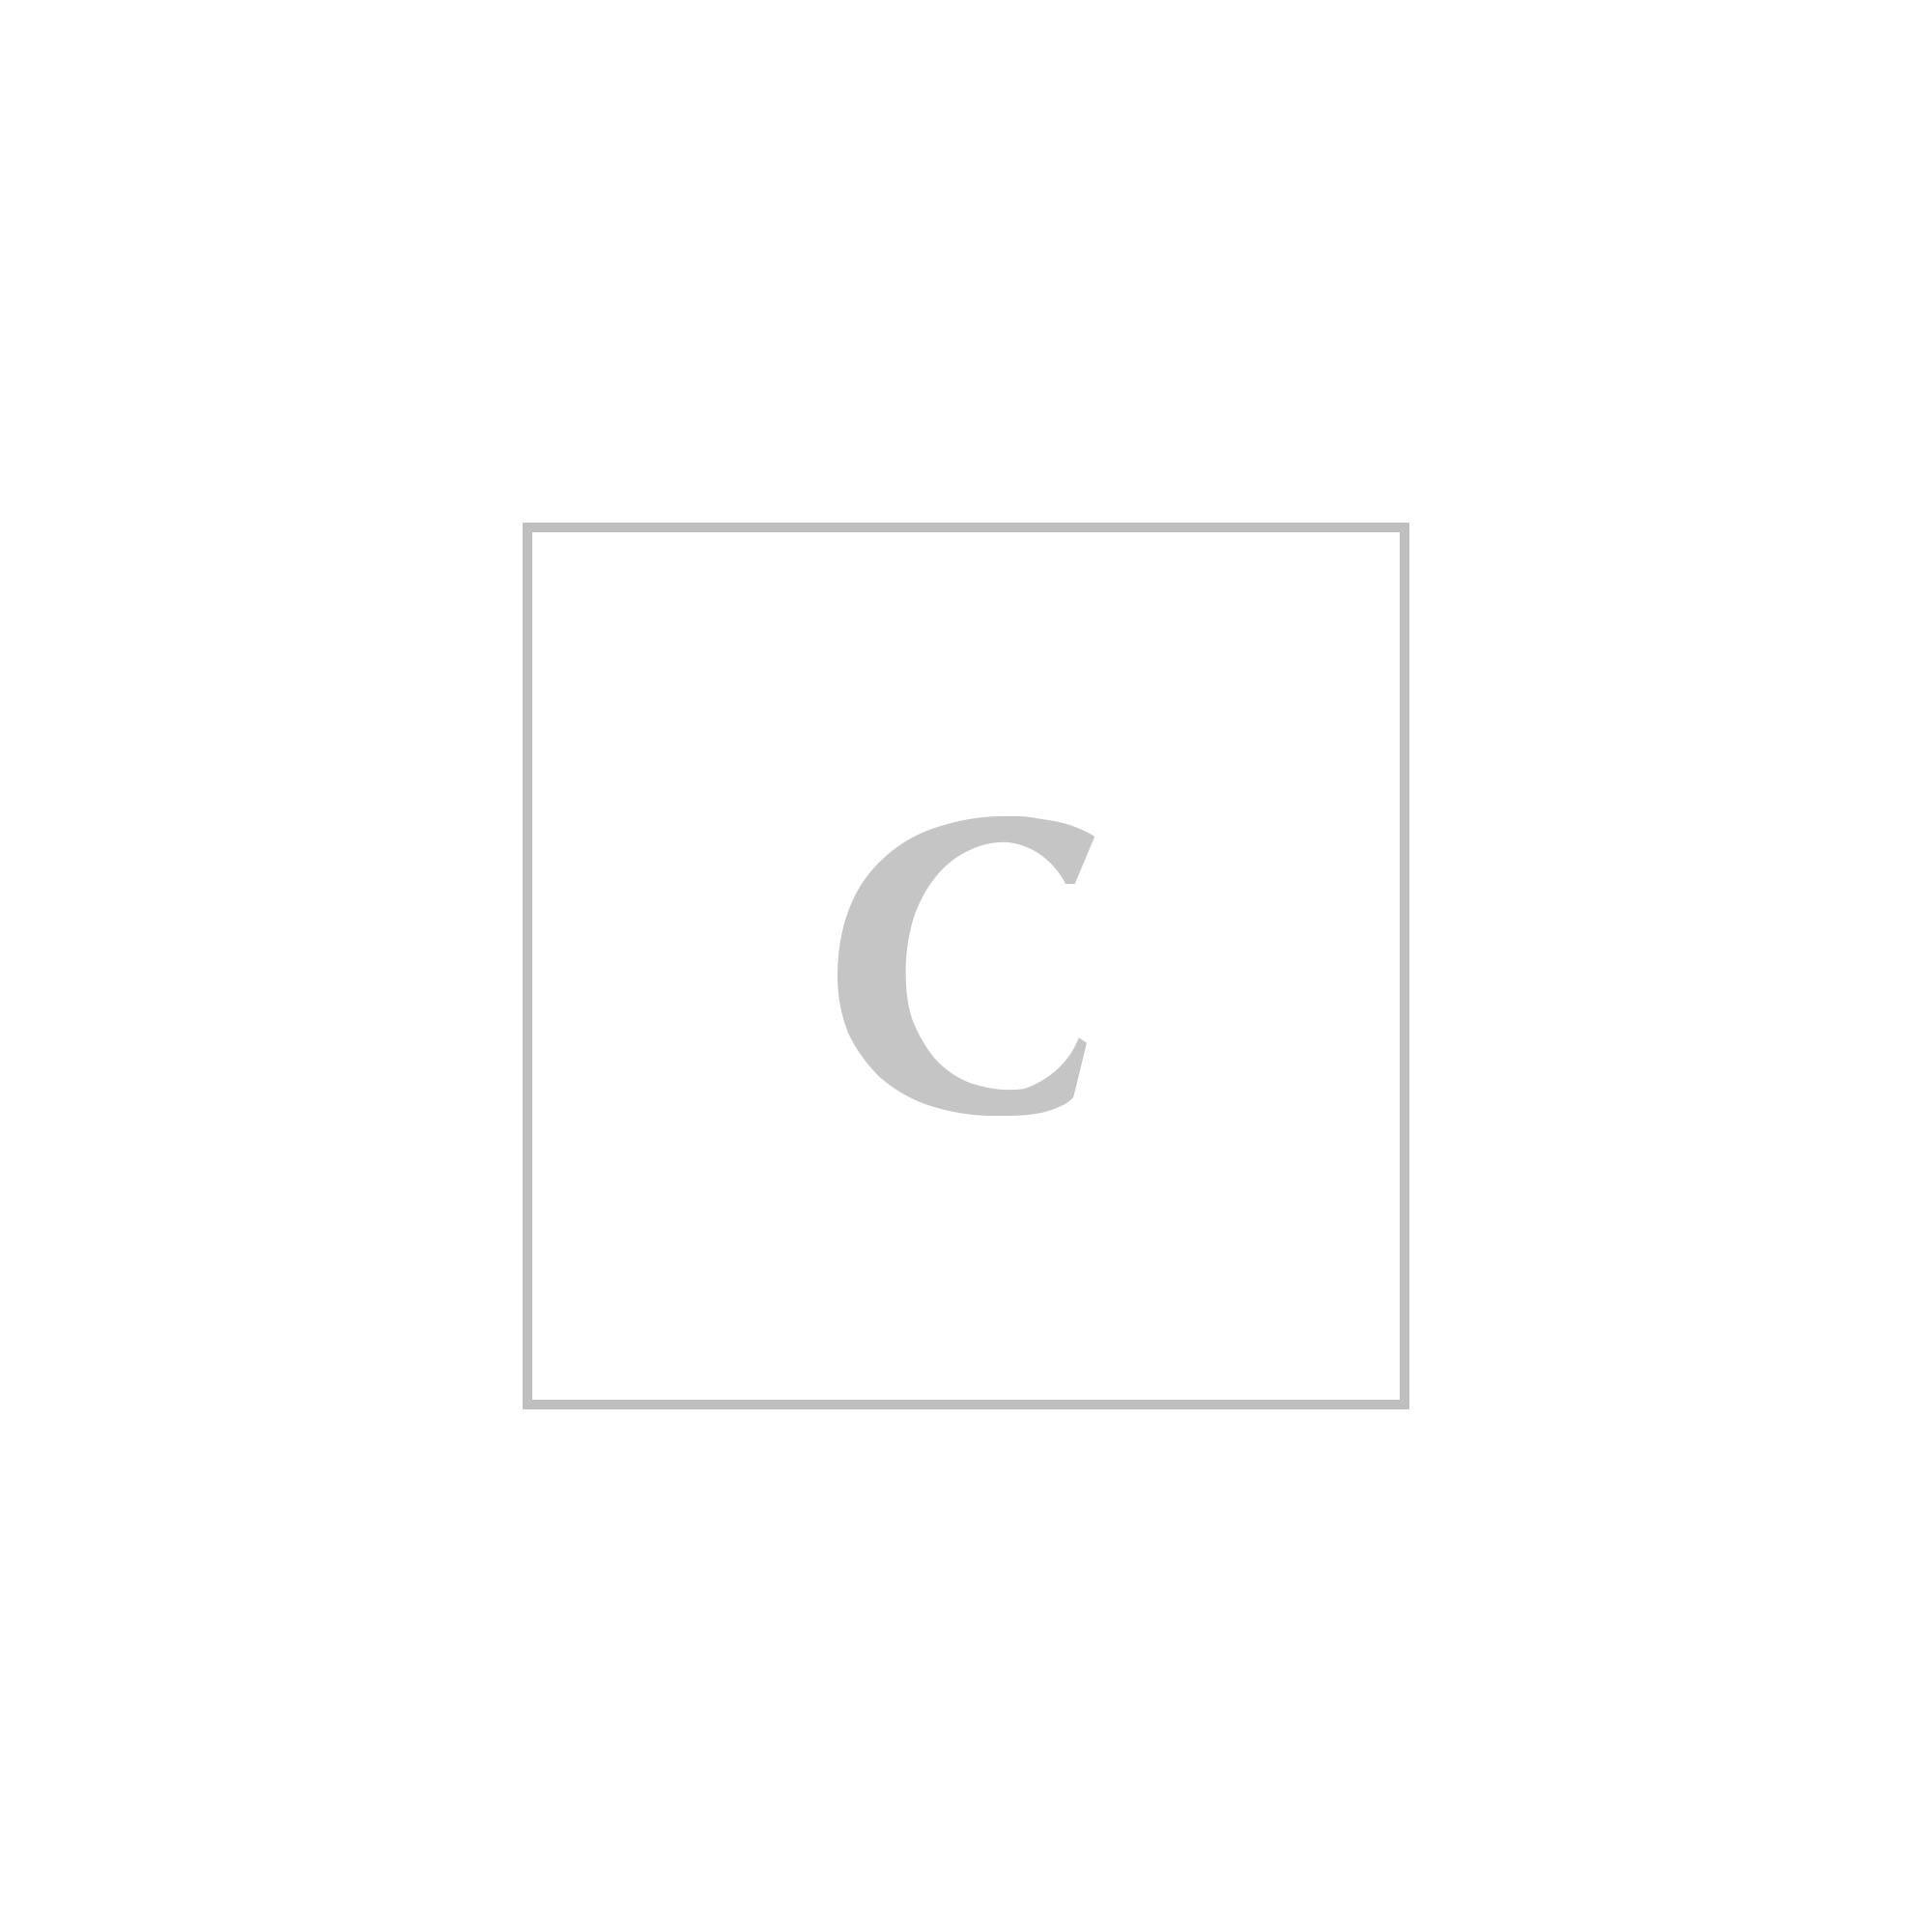 chloe' calzature donna mules woody logo